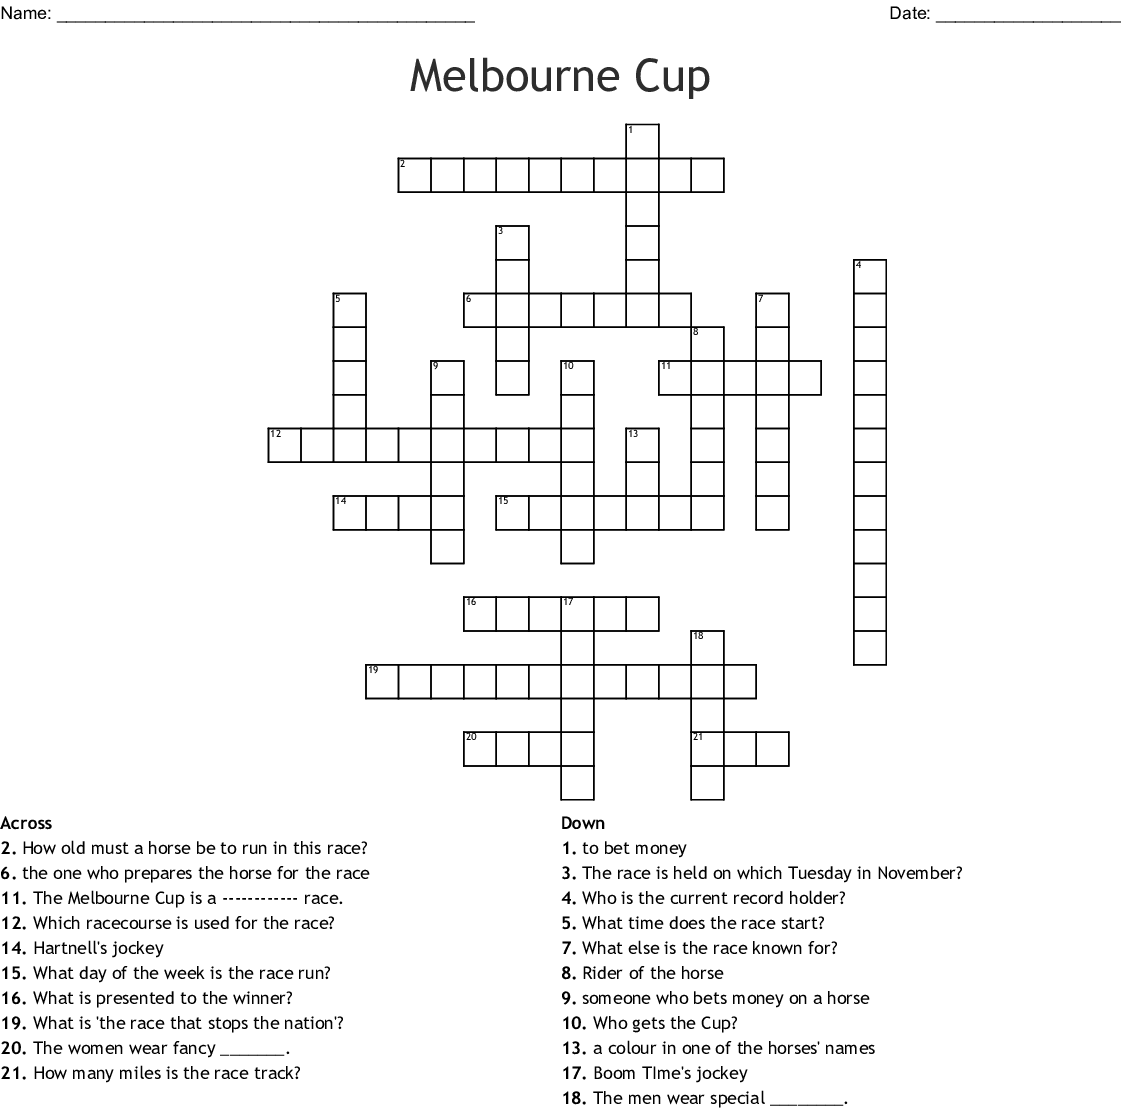 Betting money crossword clue jen widerstrom diet betting